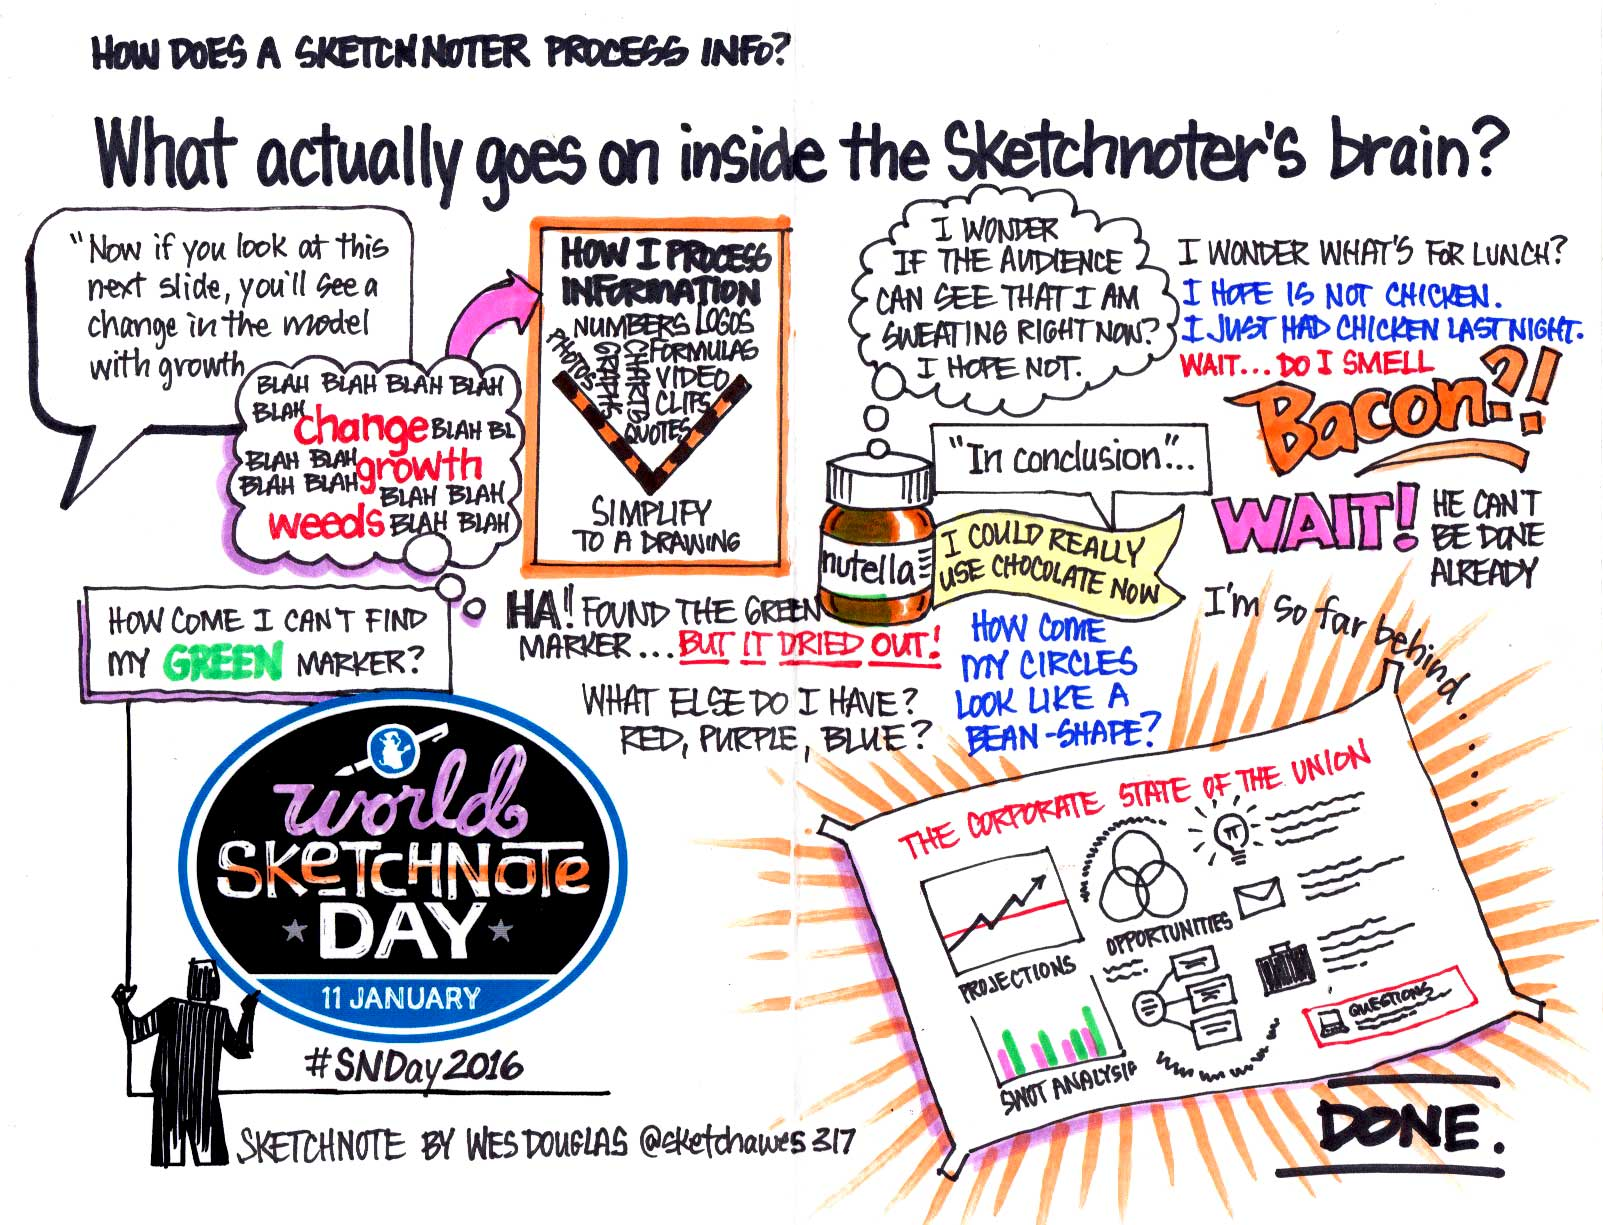 My version of the SketchNoter's brain activity. #SNDay2016 #sketchnotearmy #sketchnote https://t.co/GUP11detEb